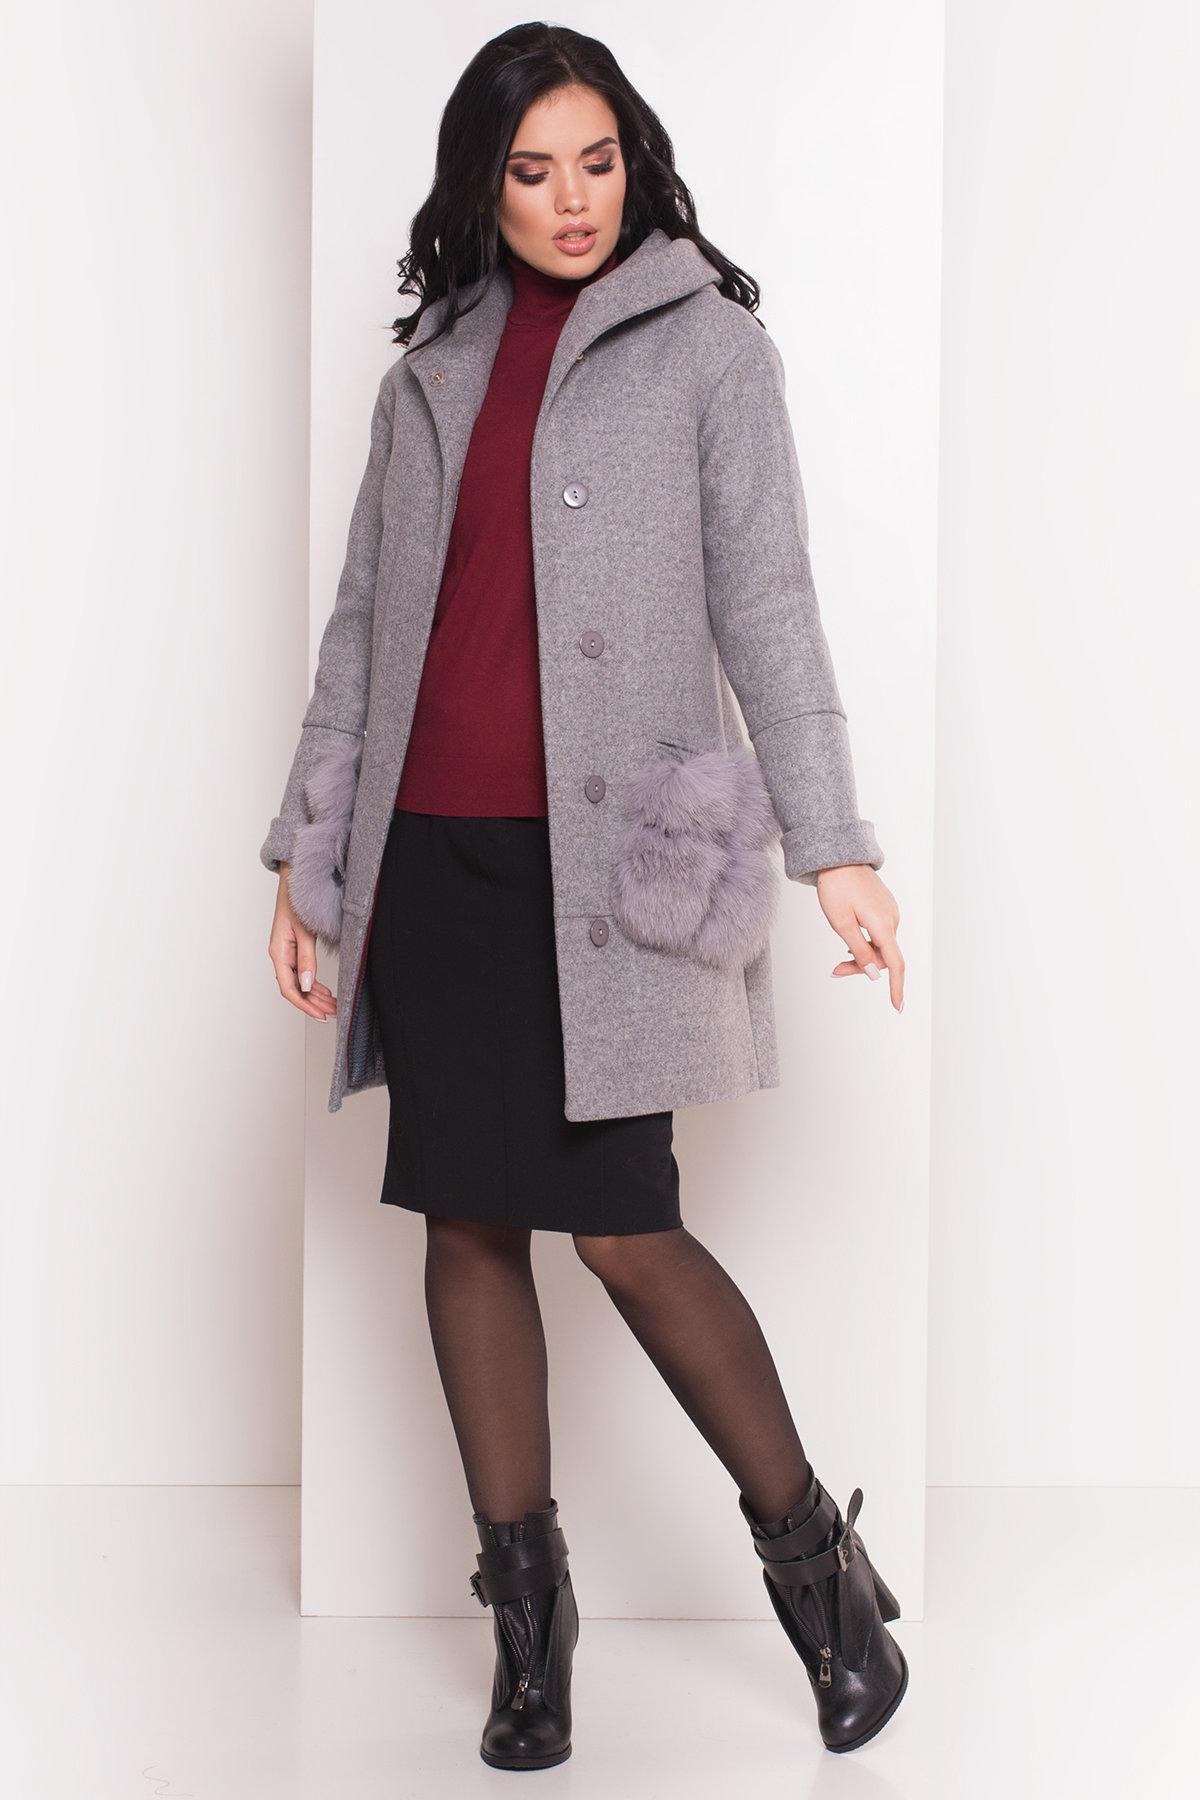 Пальто зима Анита 5752 Цвет: Серый Светлый 77